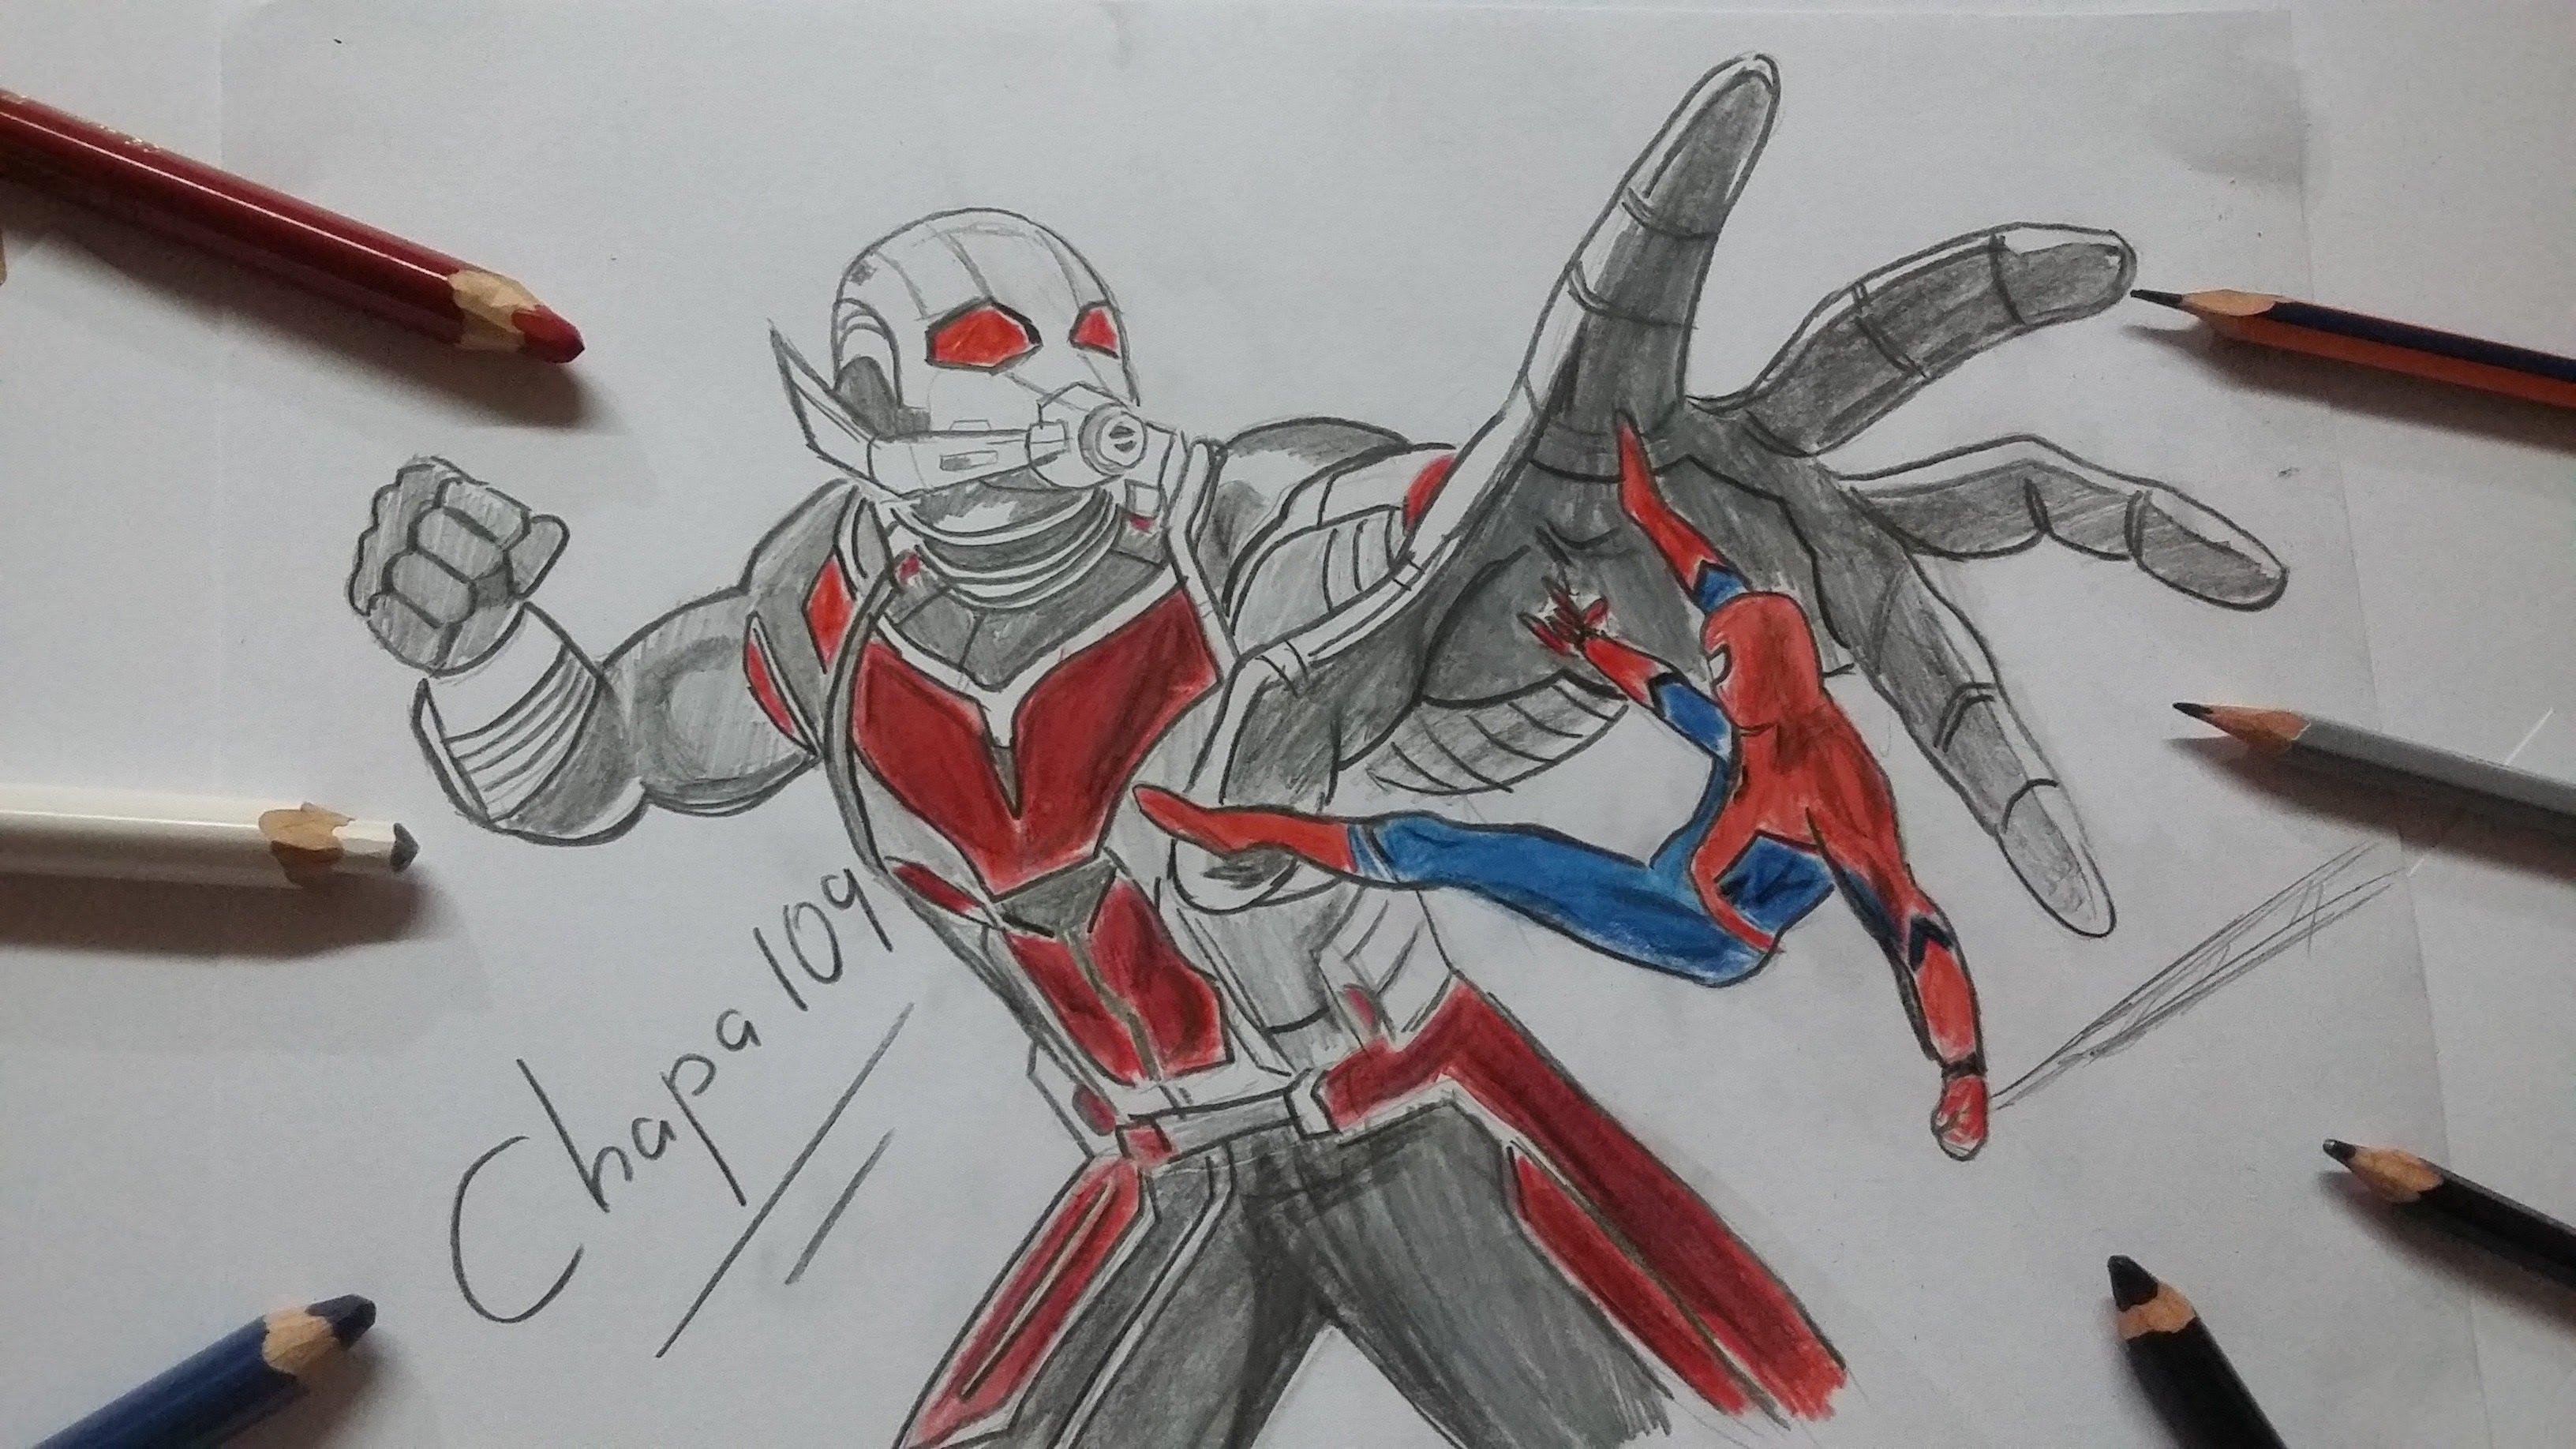 3264x1836 Dibujo De Ant Man Vs Spiderman Civil War Drawing Ant Man Vs